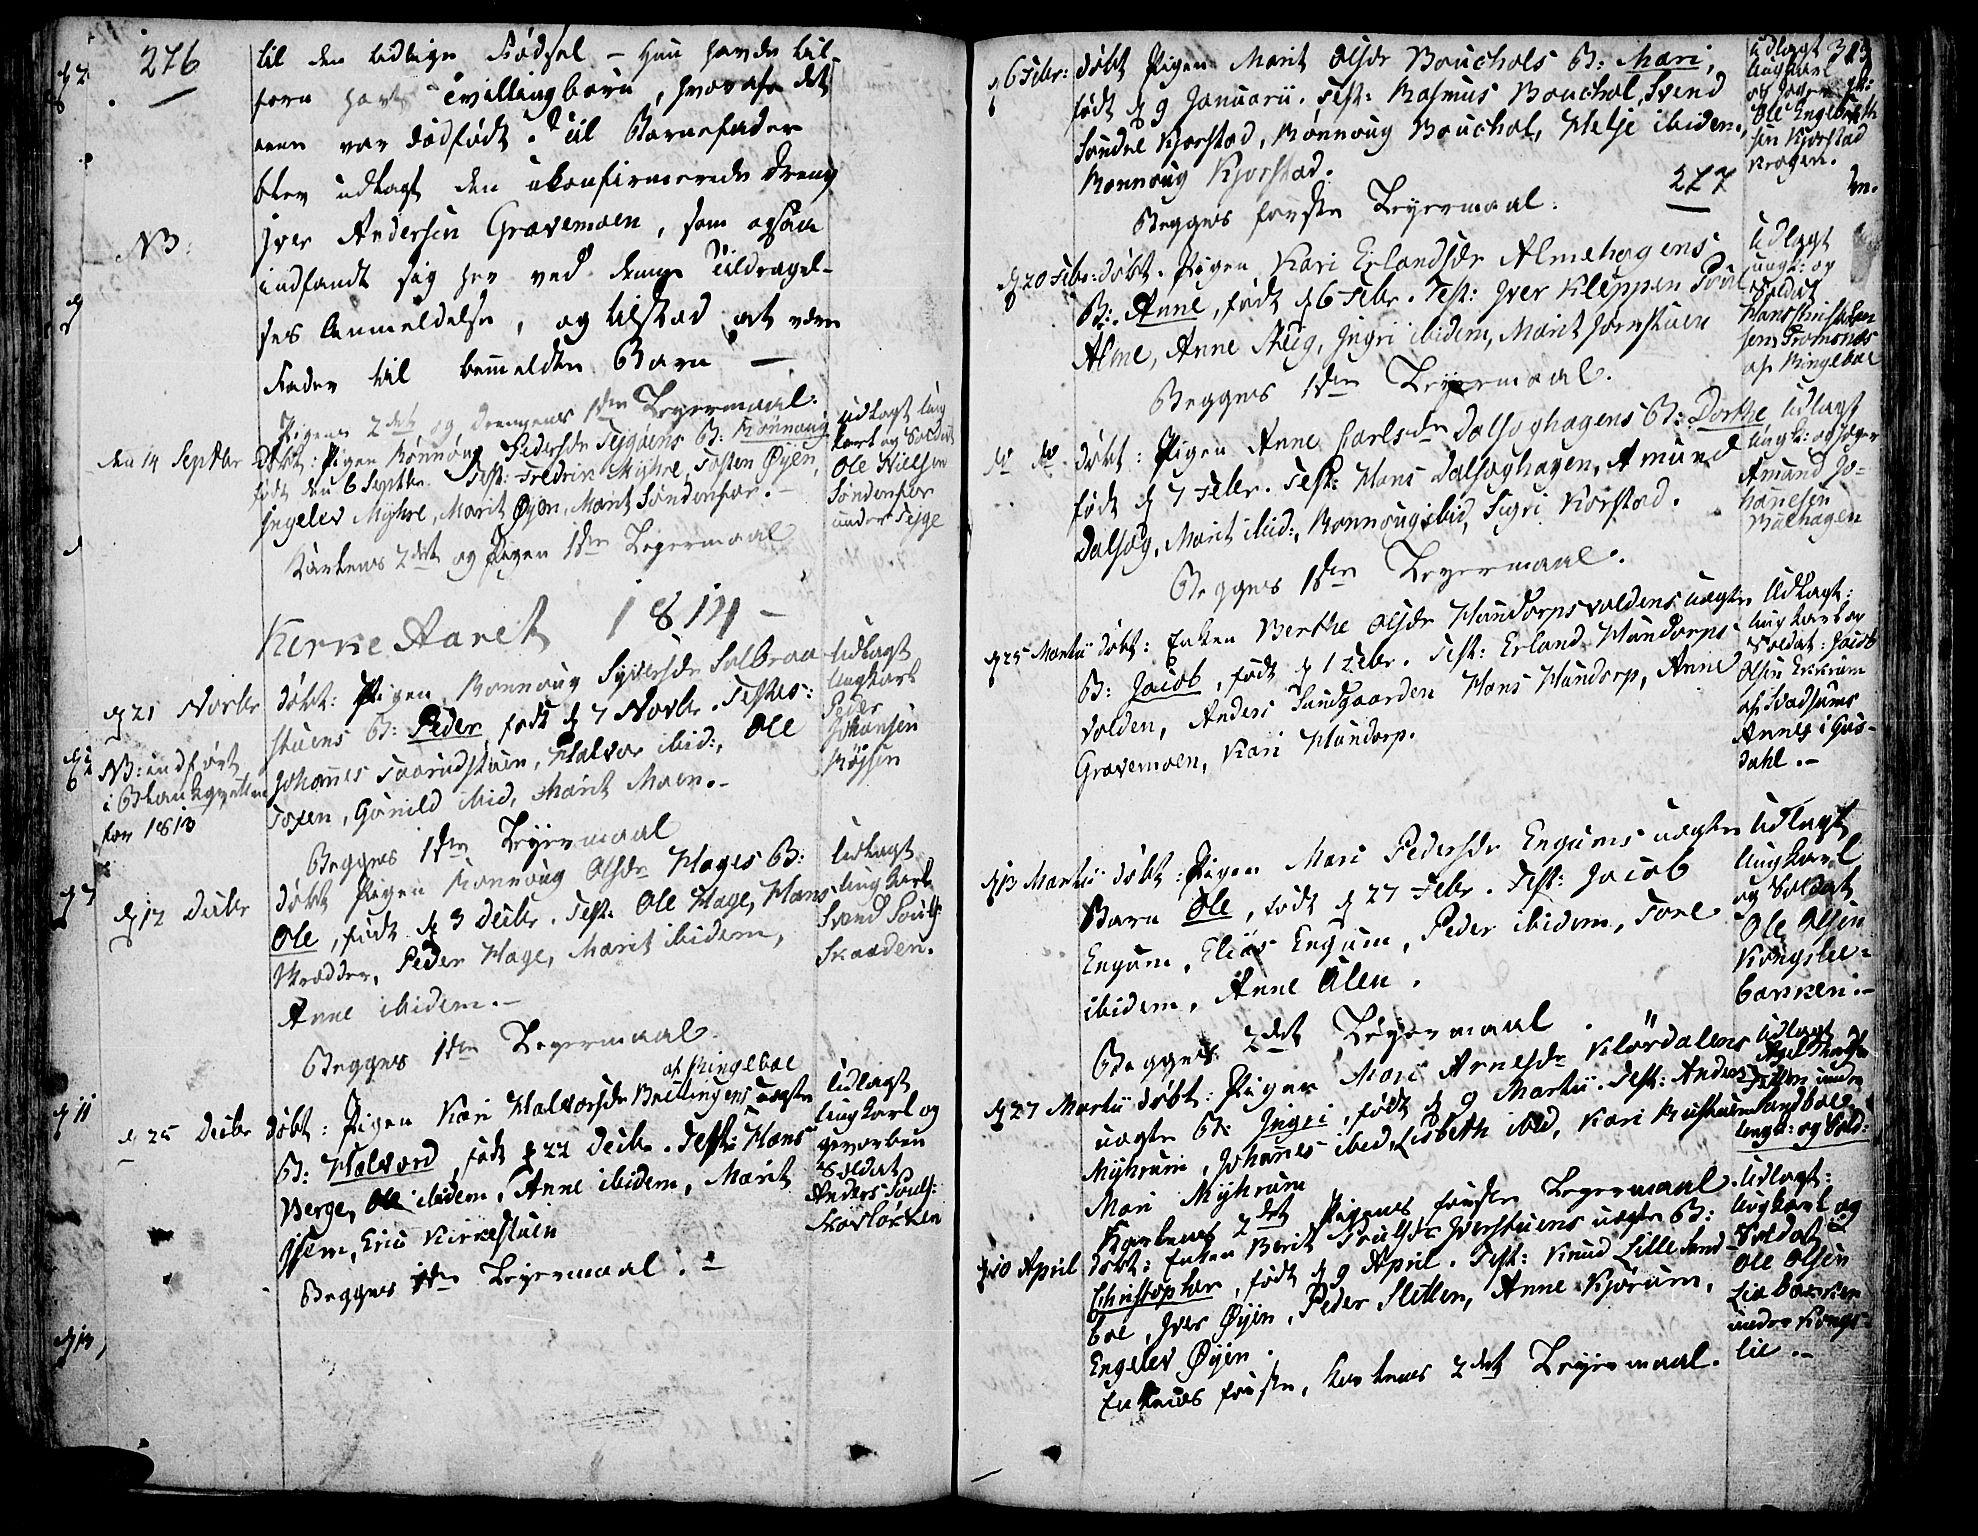 SAH, Fron prestekontor, H/Ha/Haa/L0001: Ministerialbok nr. 1, 1799-1816, s. 276-277